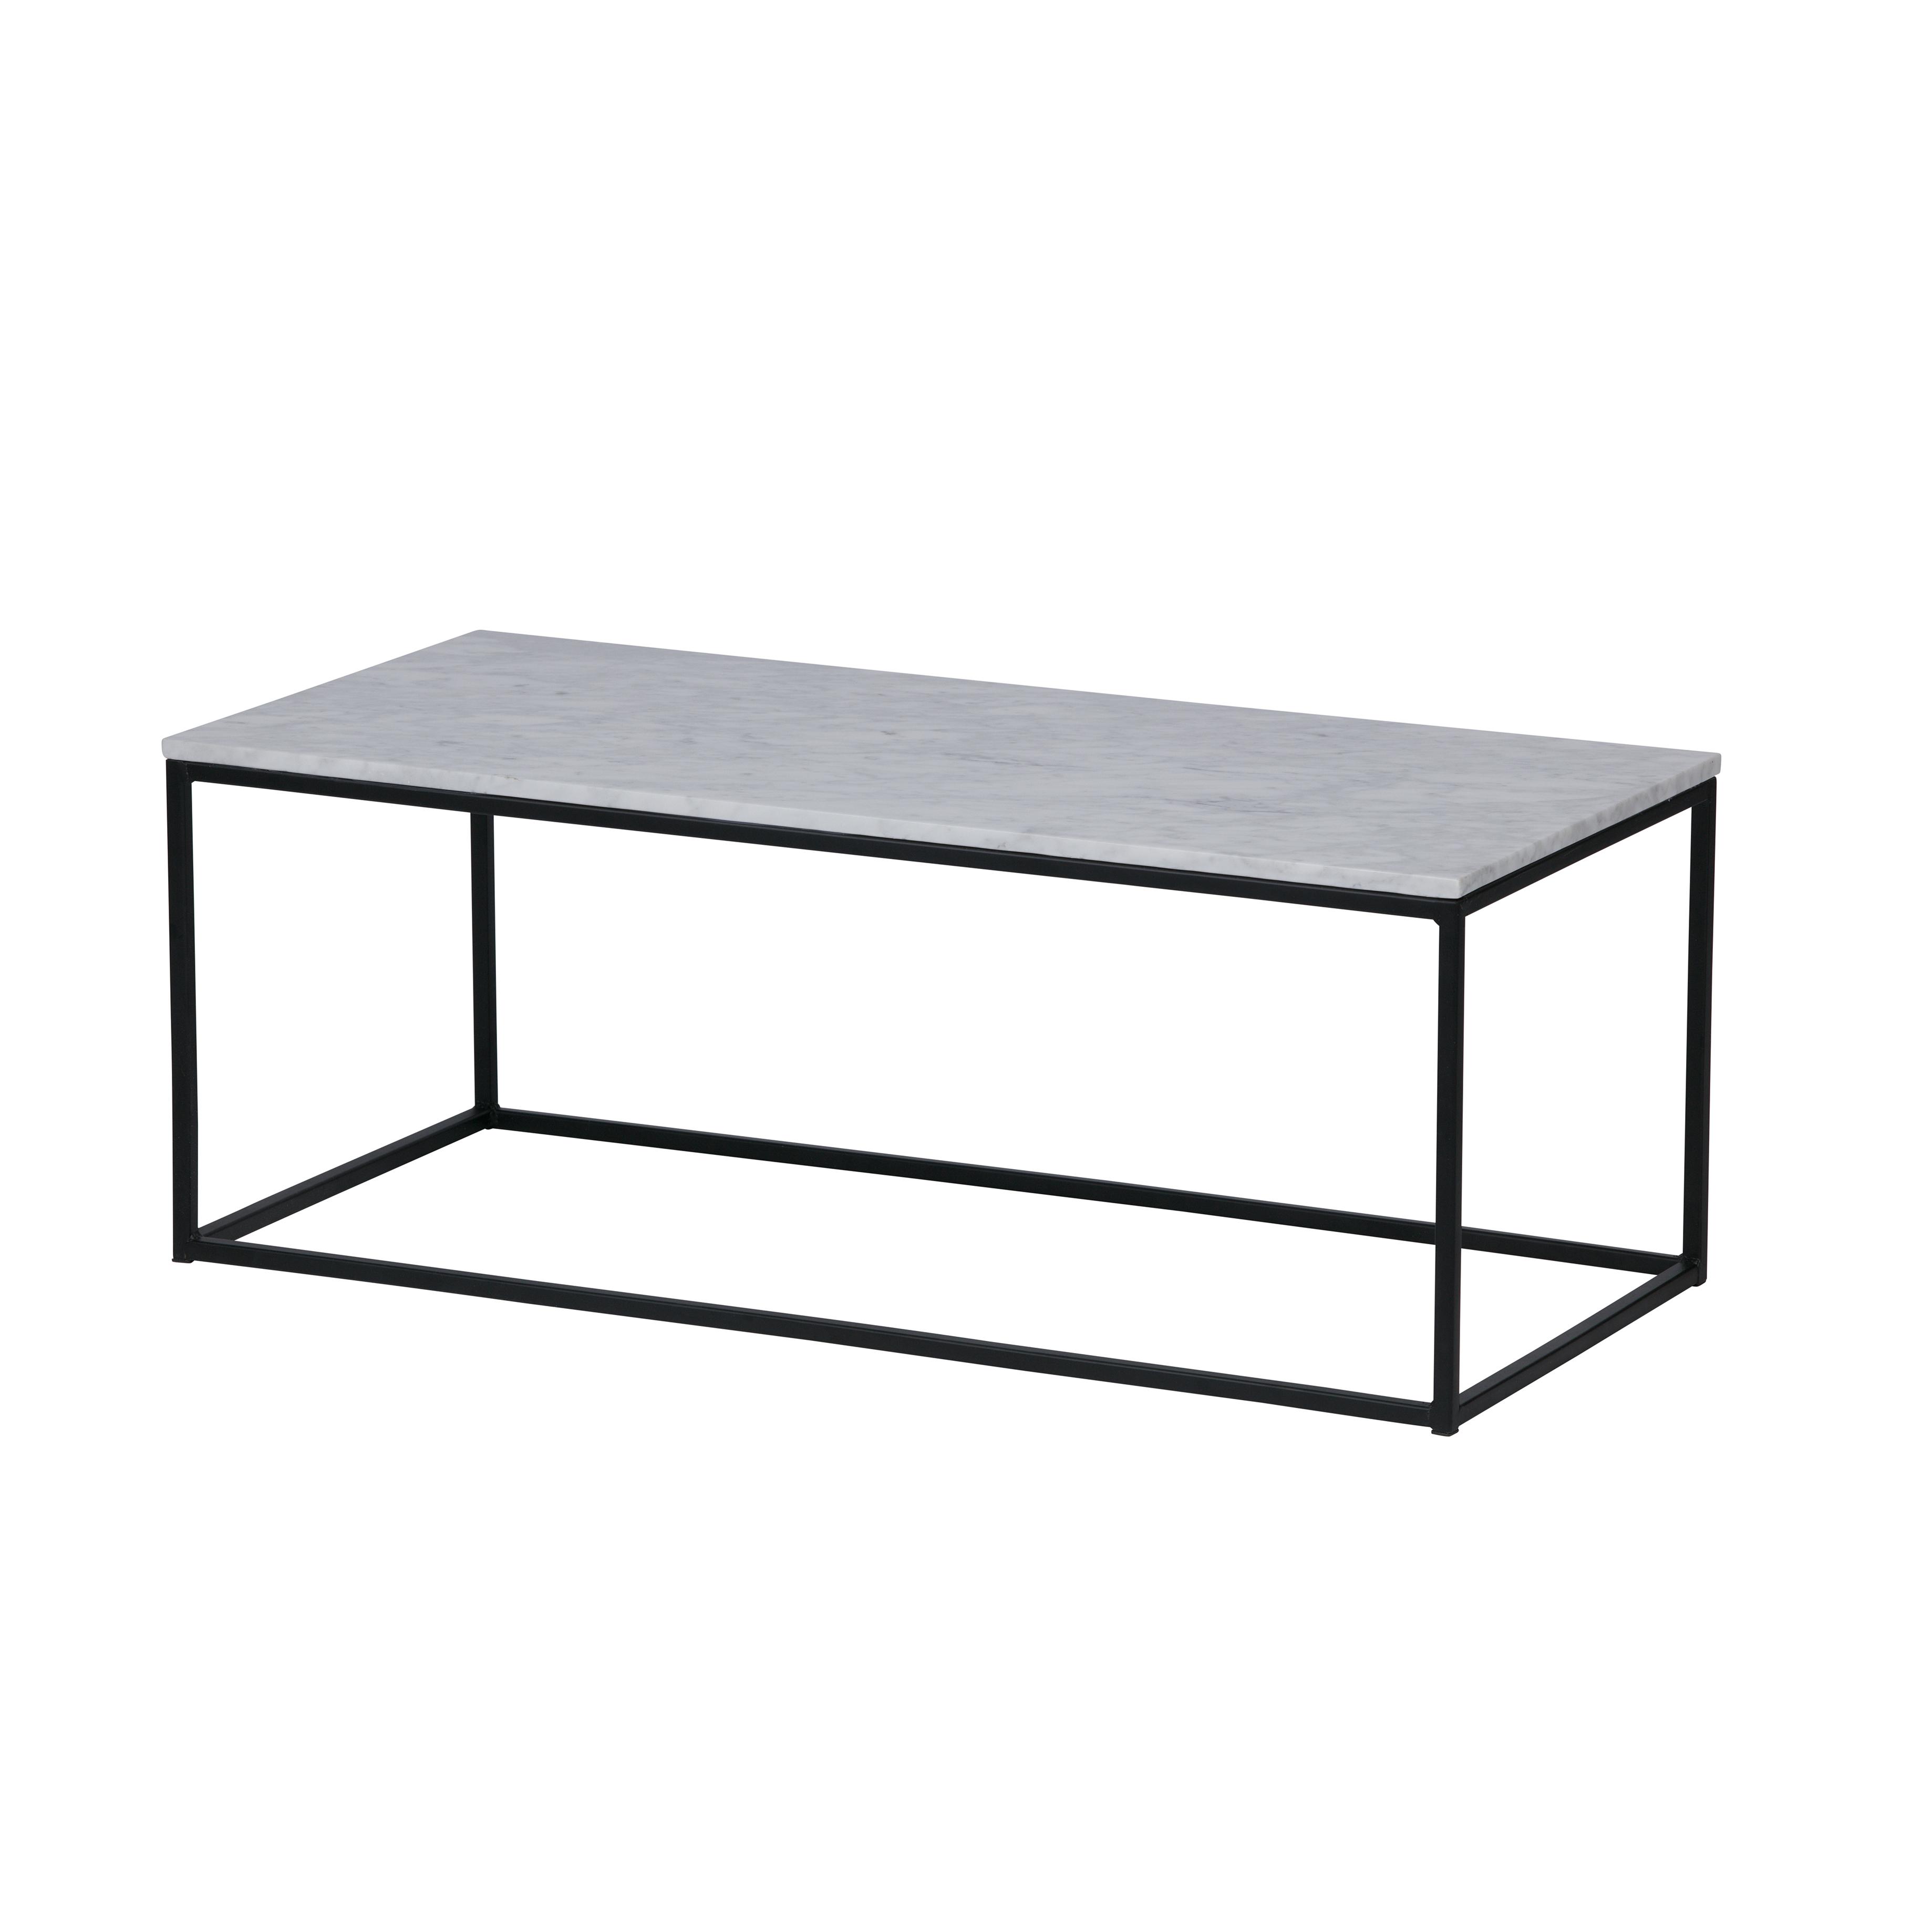 Beroemd Thor salontafel met wit marmer blad - Interieurwinkel #NK49